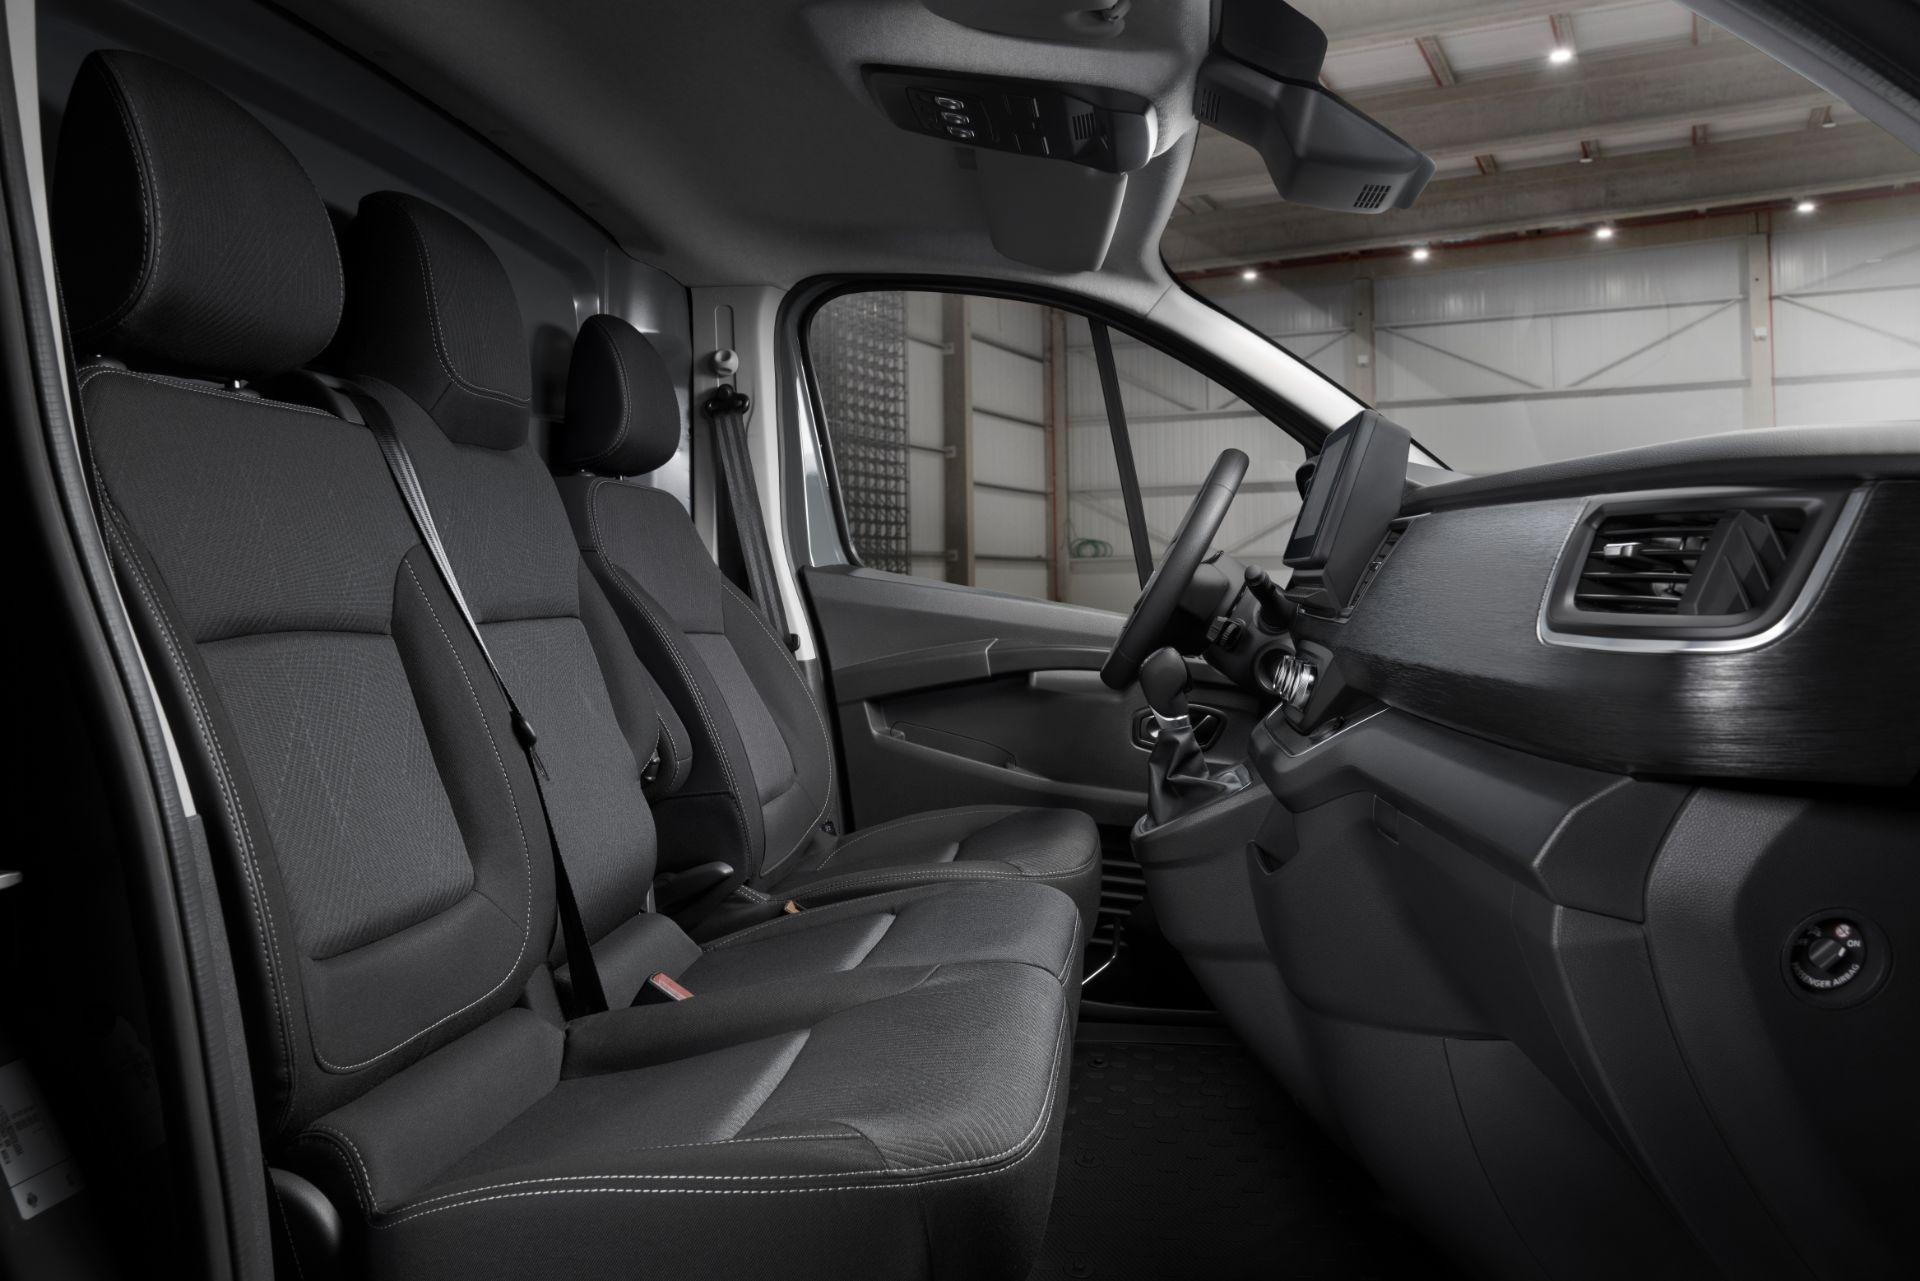 2022-Nissan-Primastar-Van-16